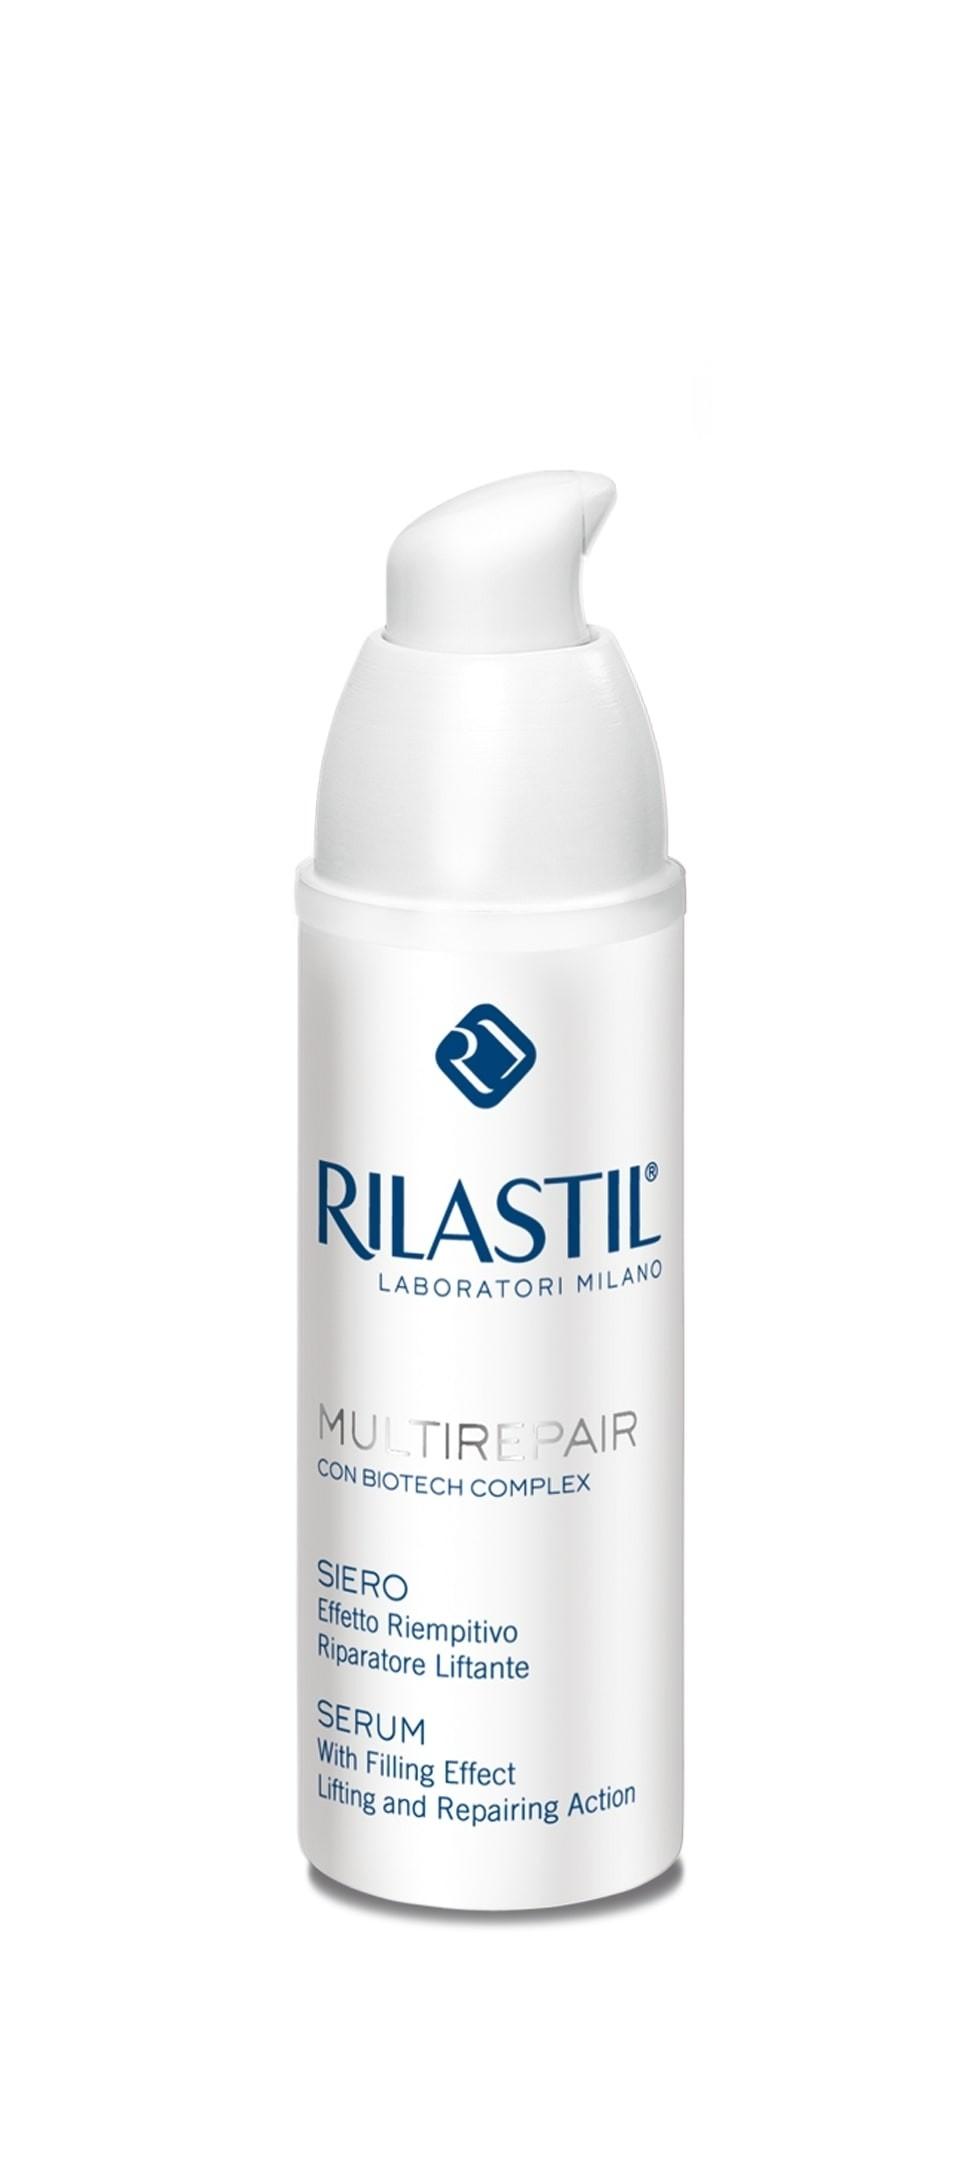 Rilastil Multirepair Siero Effetto Liftante 30ml